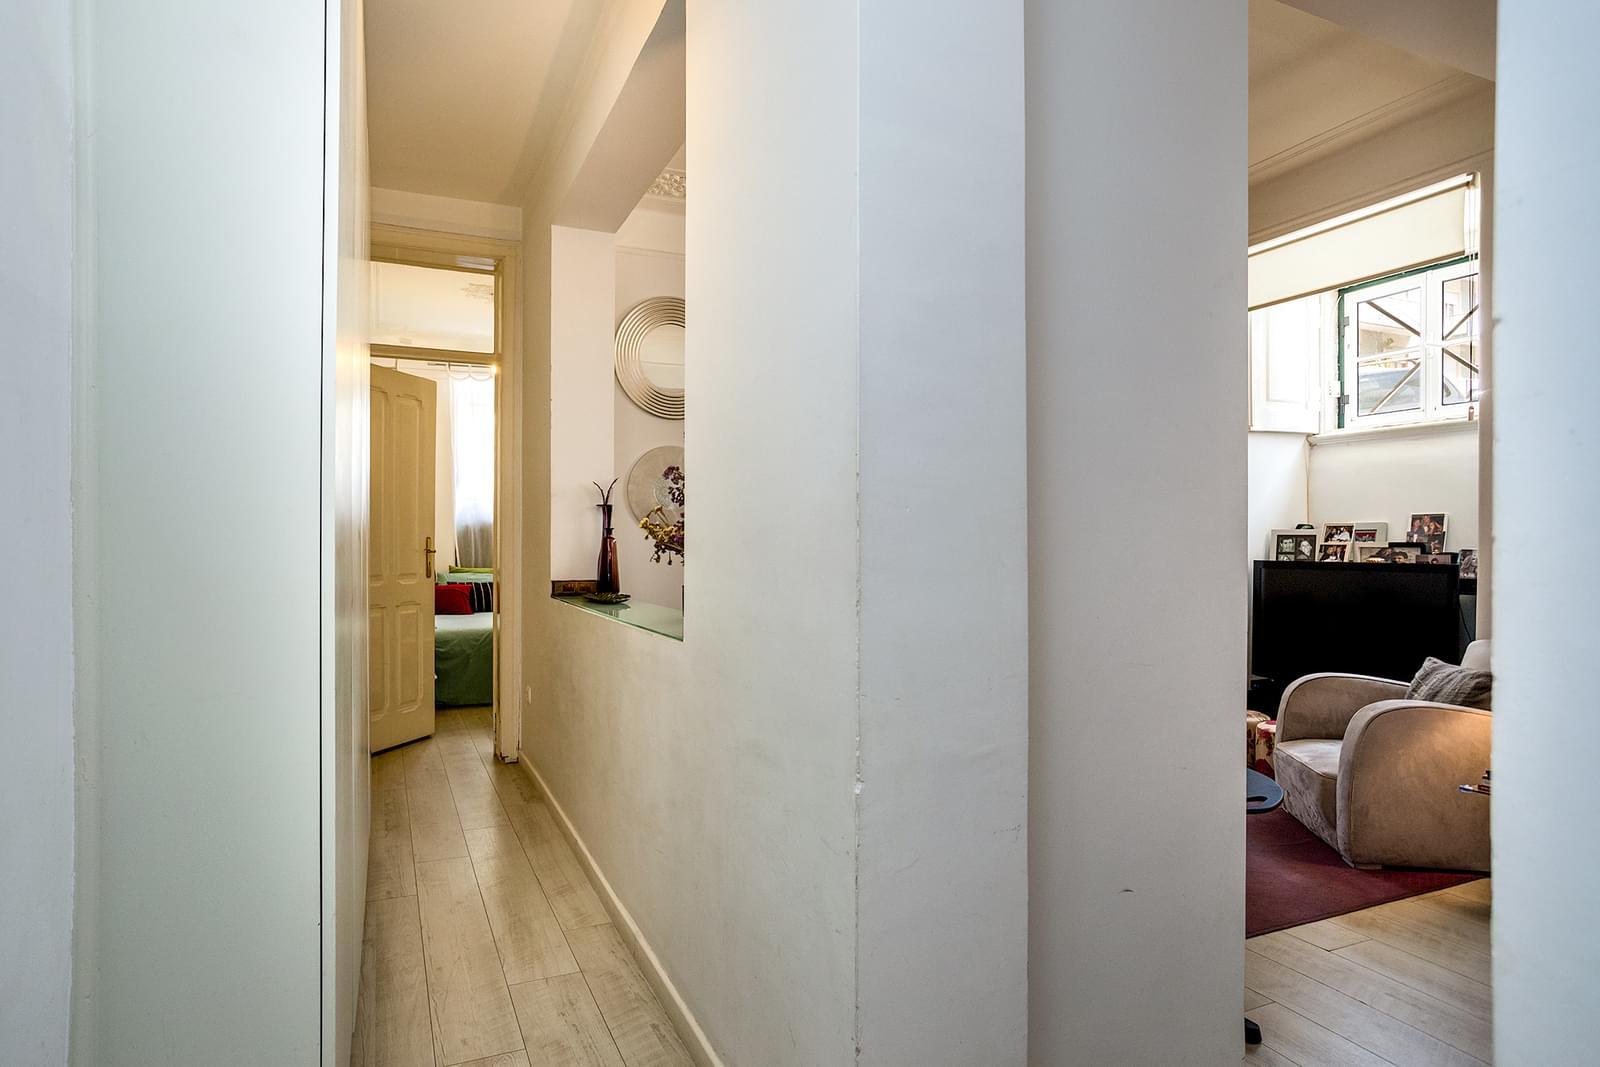 pf17379-apartamento-t3-lisboa-1e29bb14-b43e-4d60-88d3-8cb28583955e